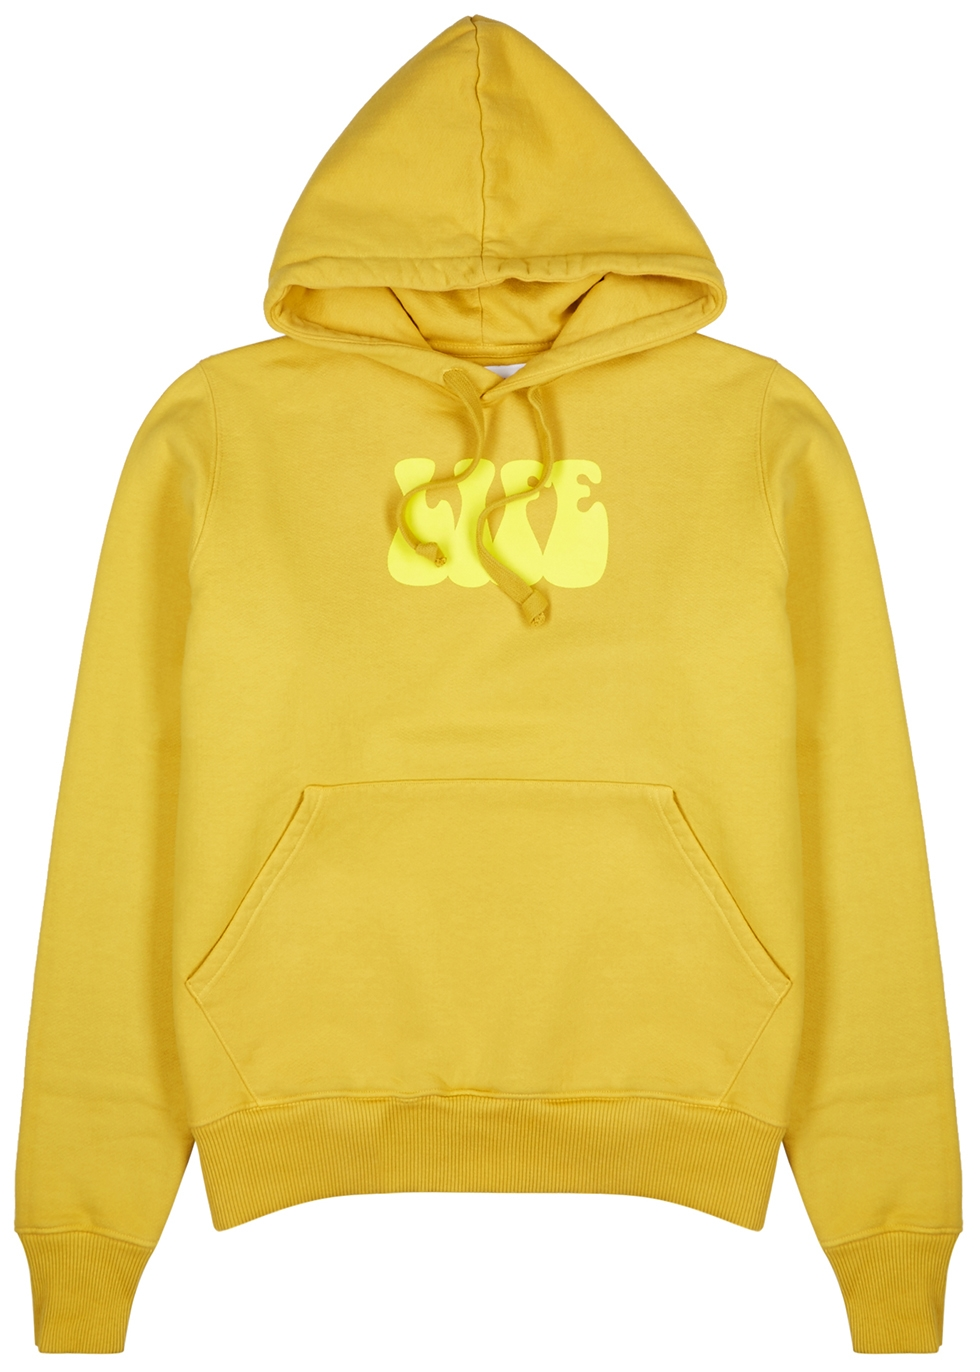 Life mustard printed cotton sweatshirt - Last Heavy